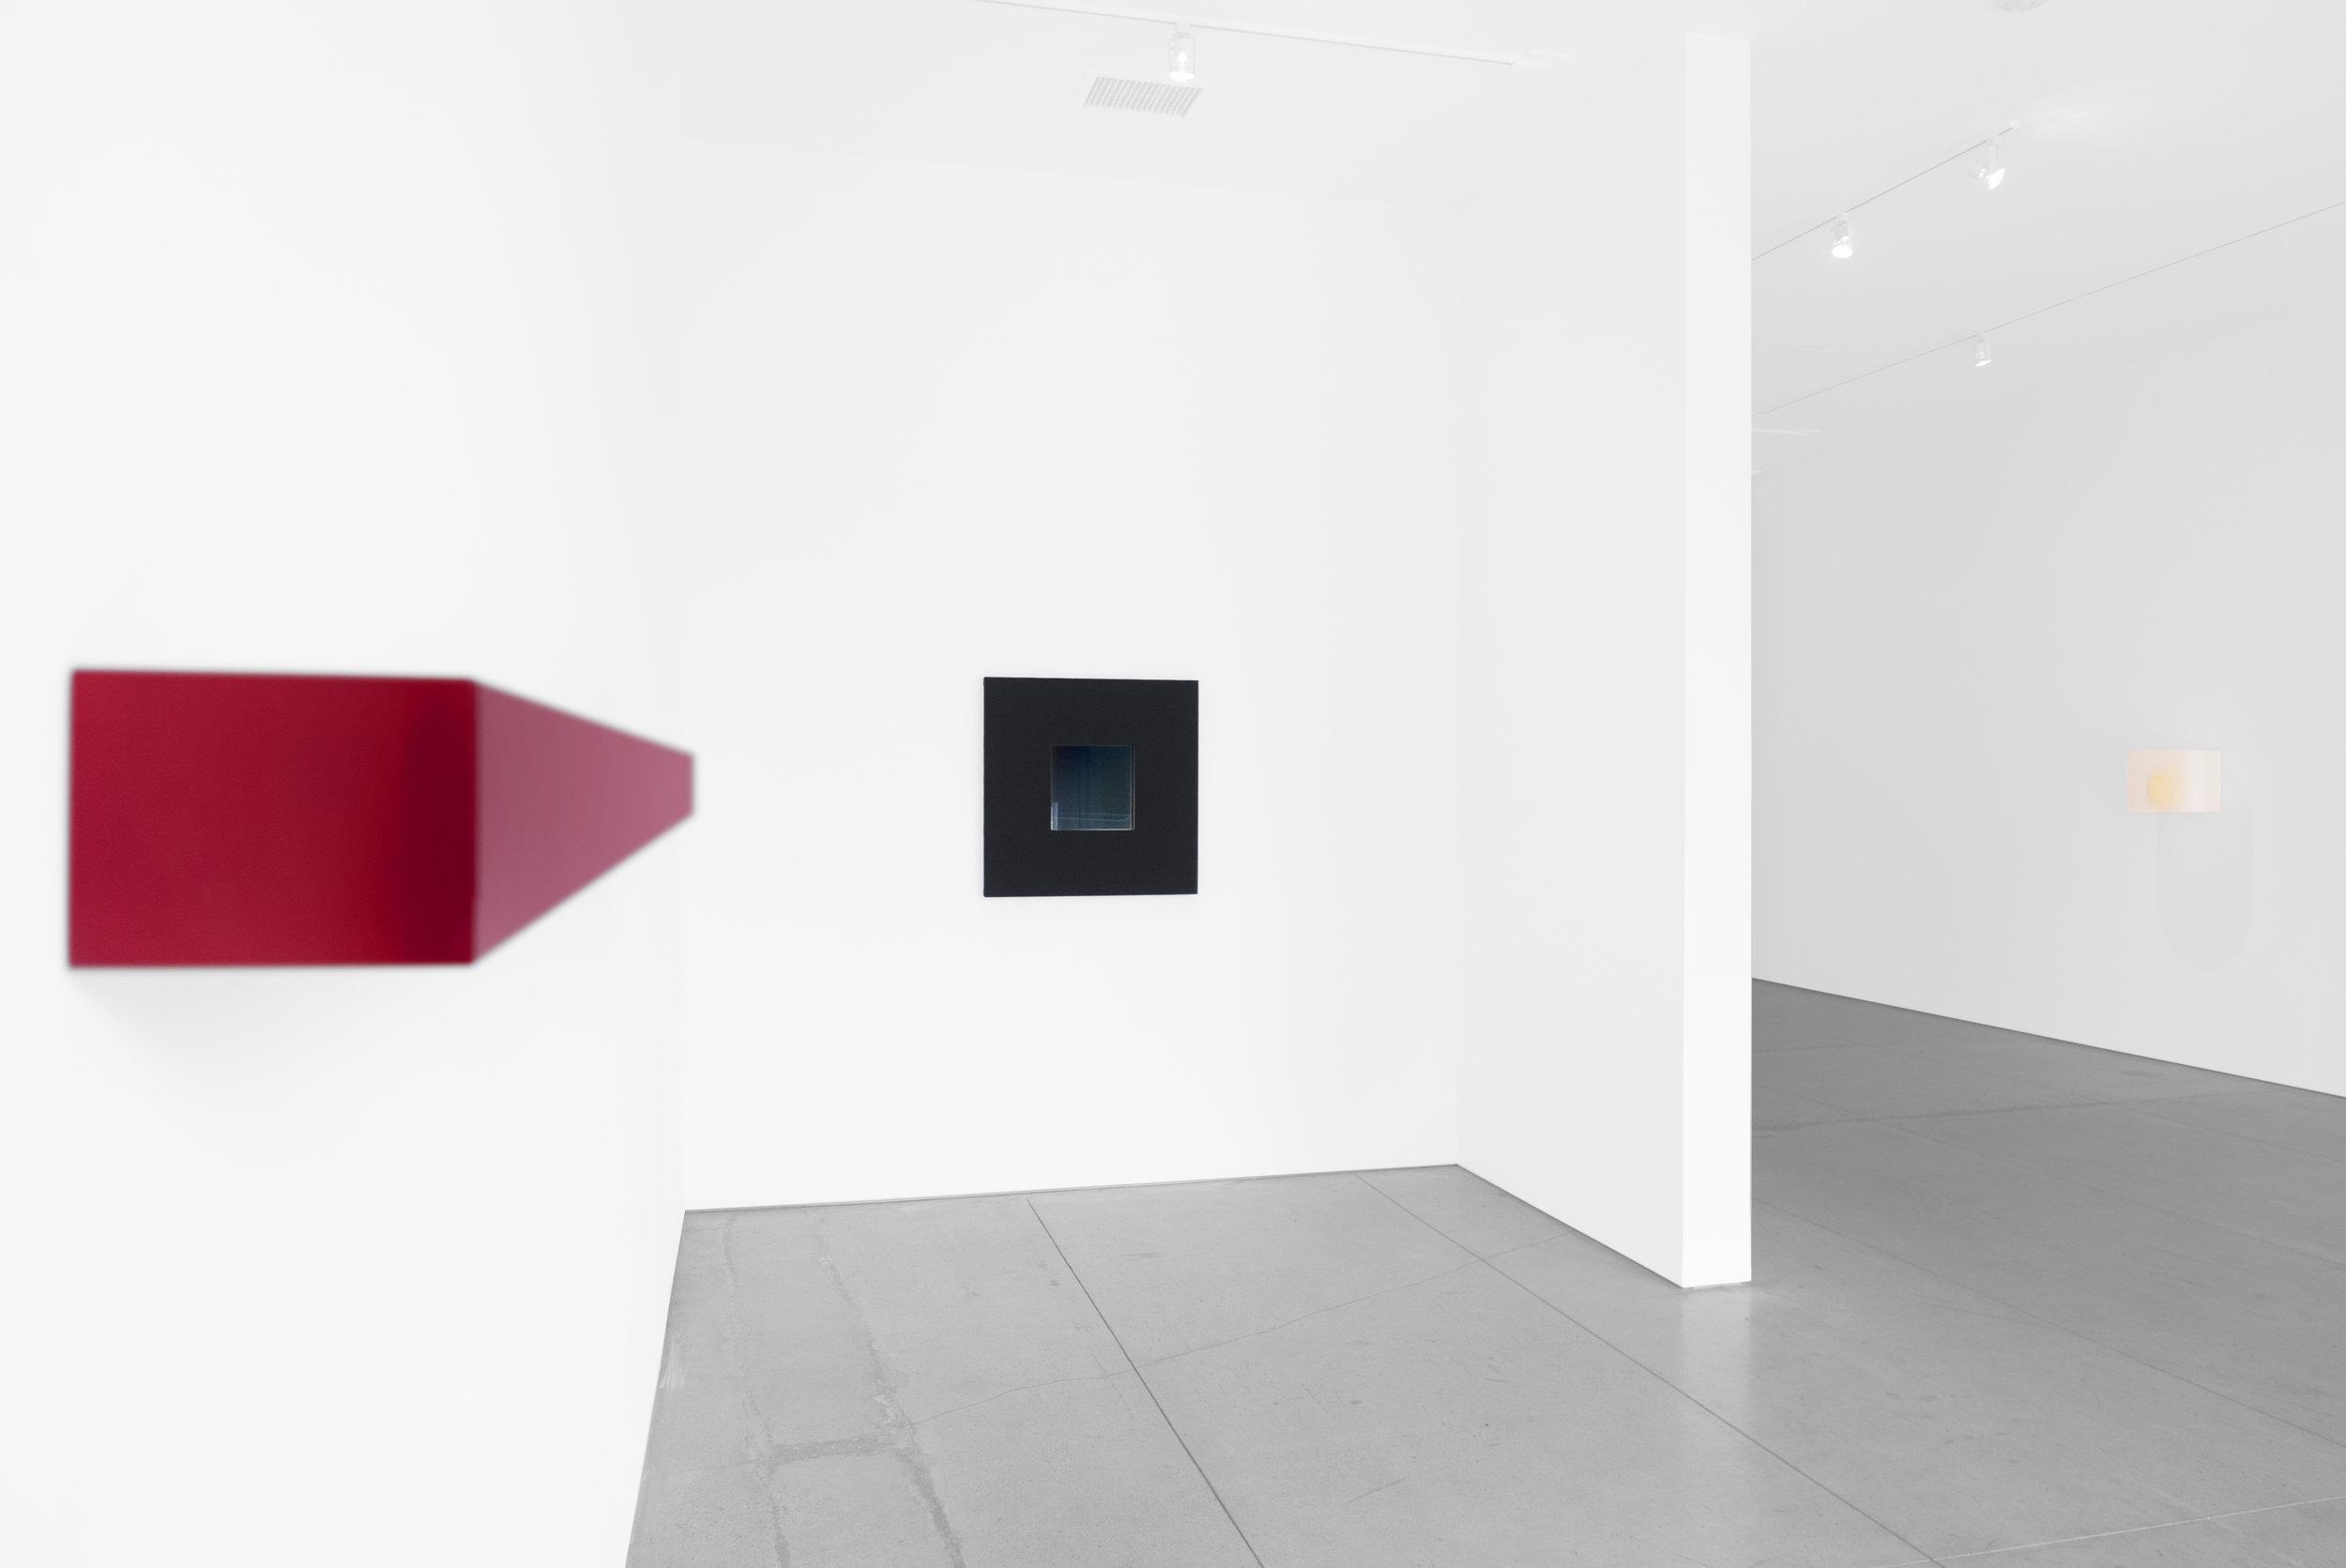 25 Years_Peter Blake Gallery_2019_Installation View_3.jpg